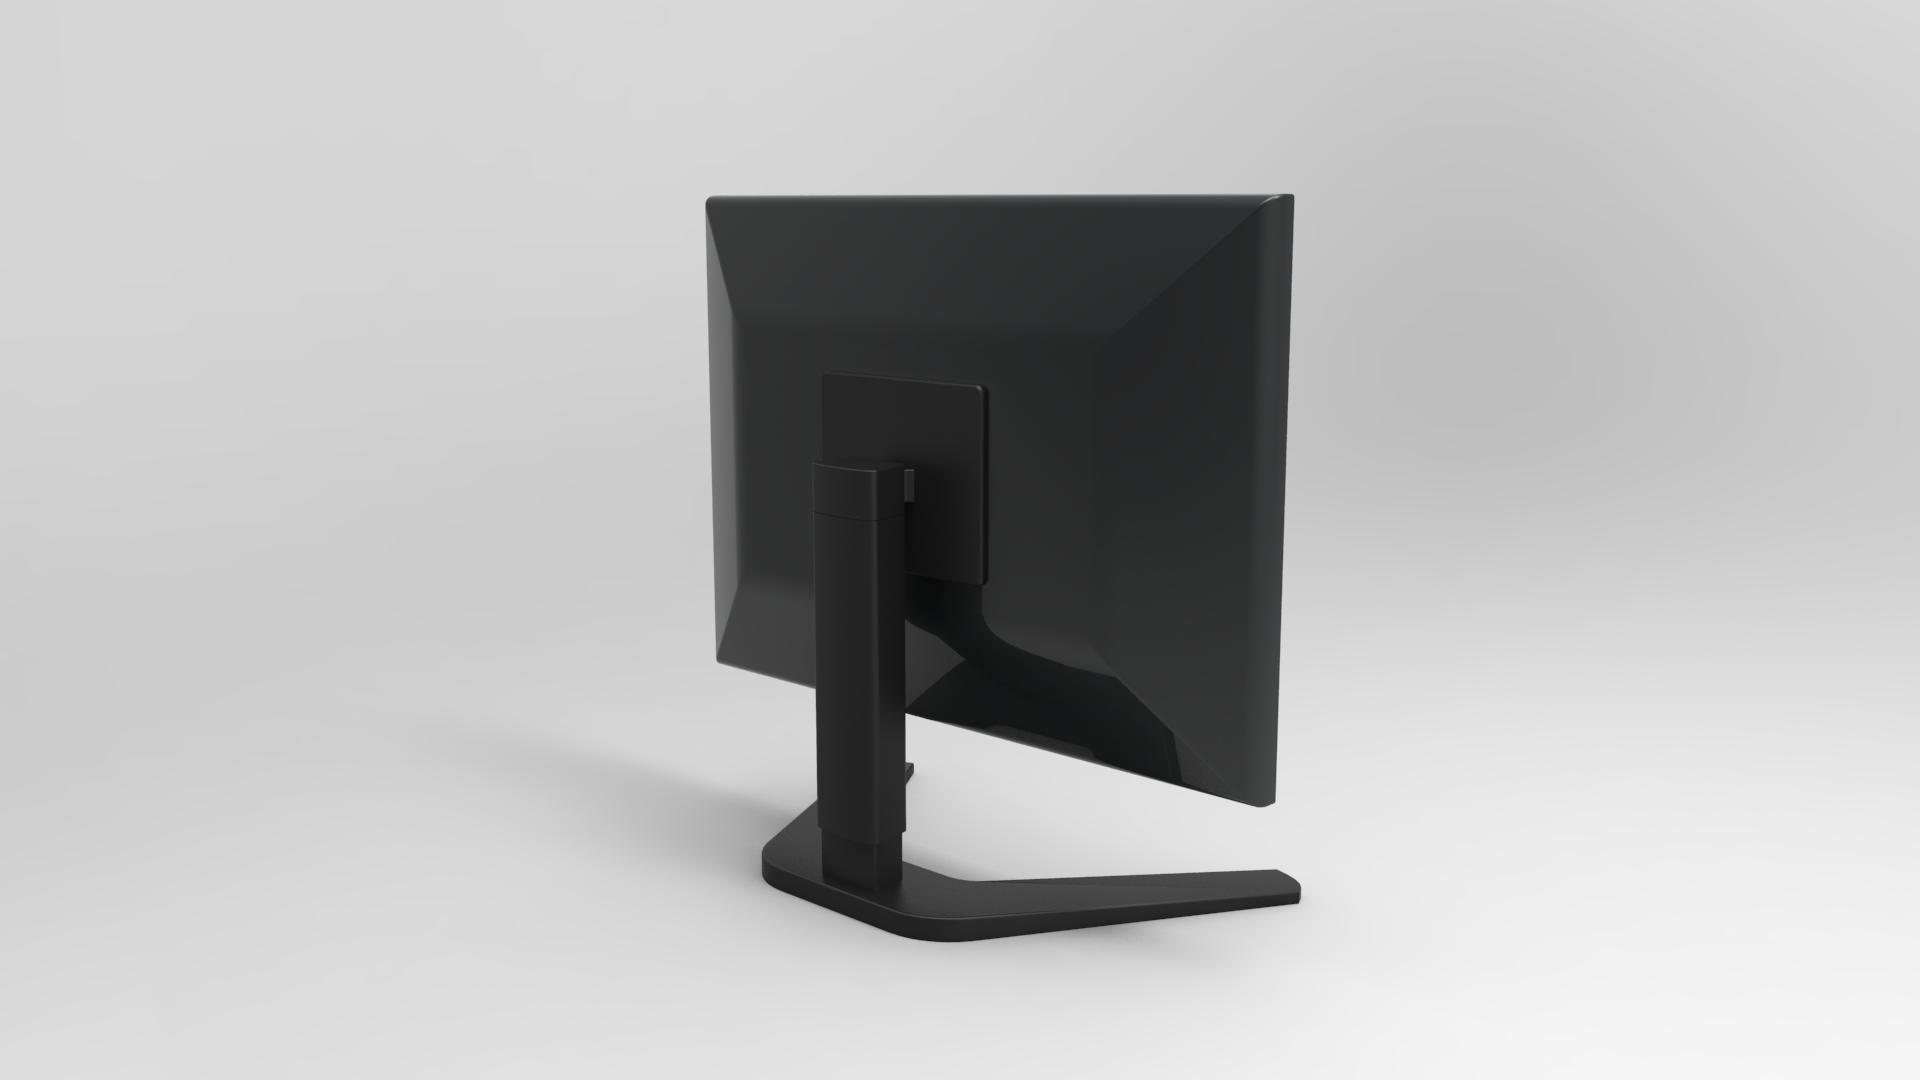 GeyiG - Realistic Monitor 3D Model